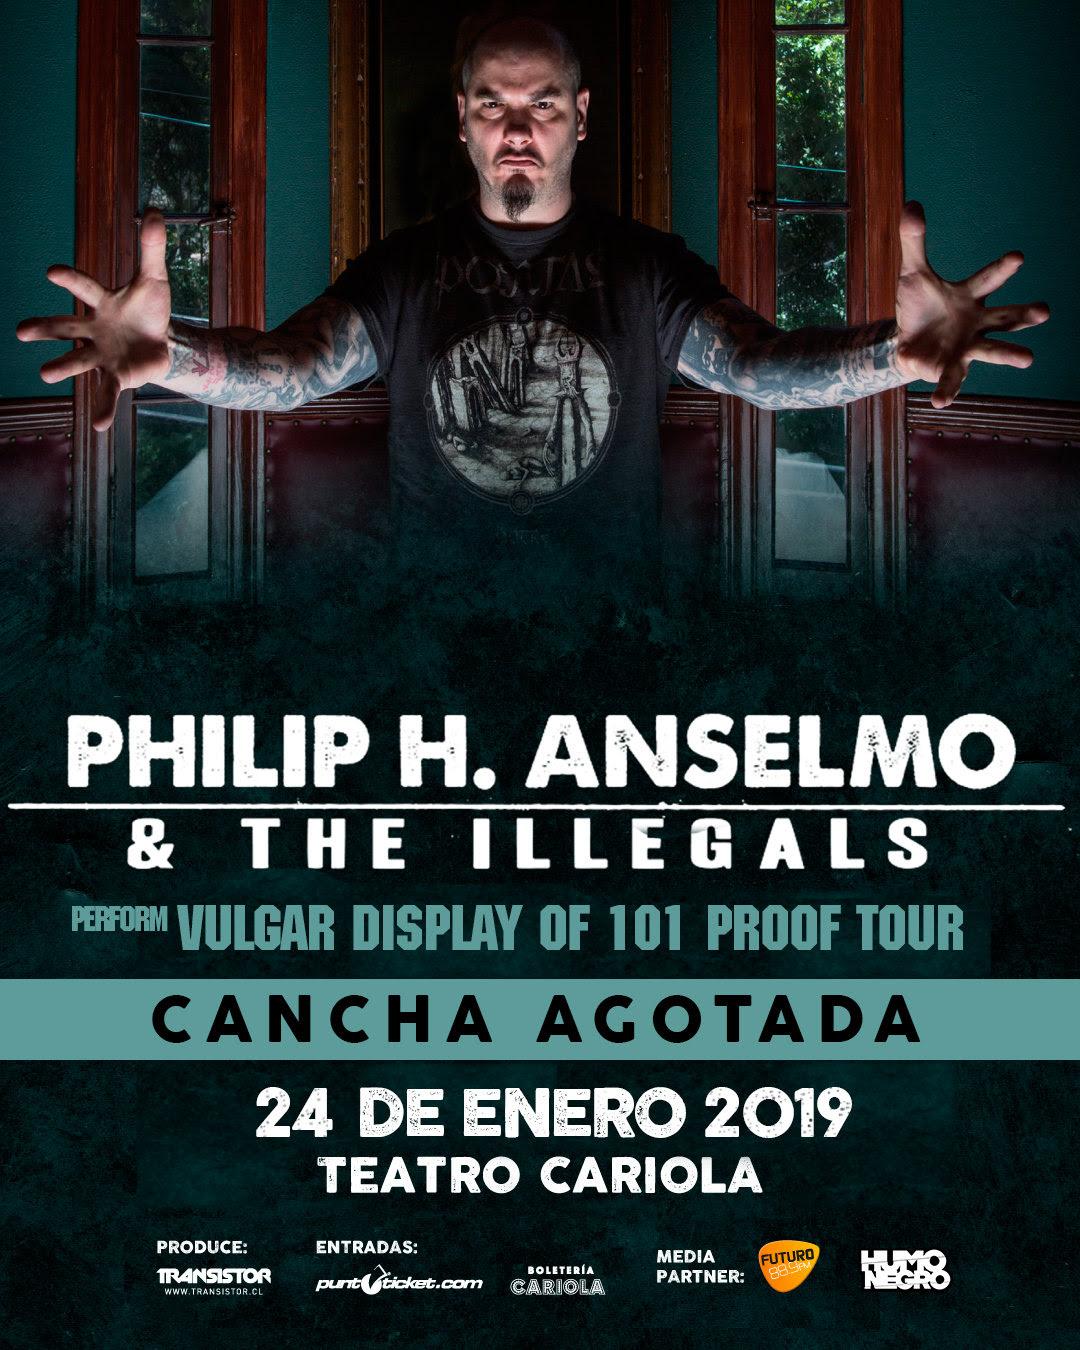 Phil Anselmo anuncia que show en Chile será completo de canciones de Pantera